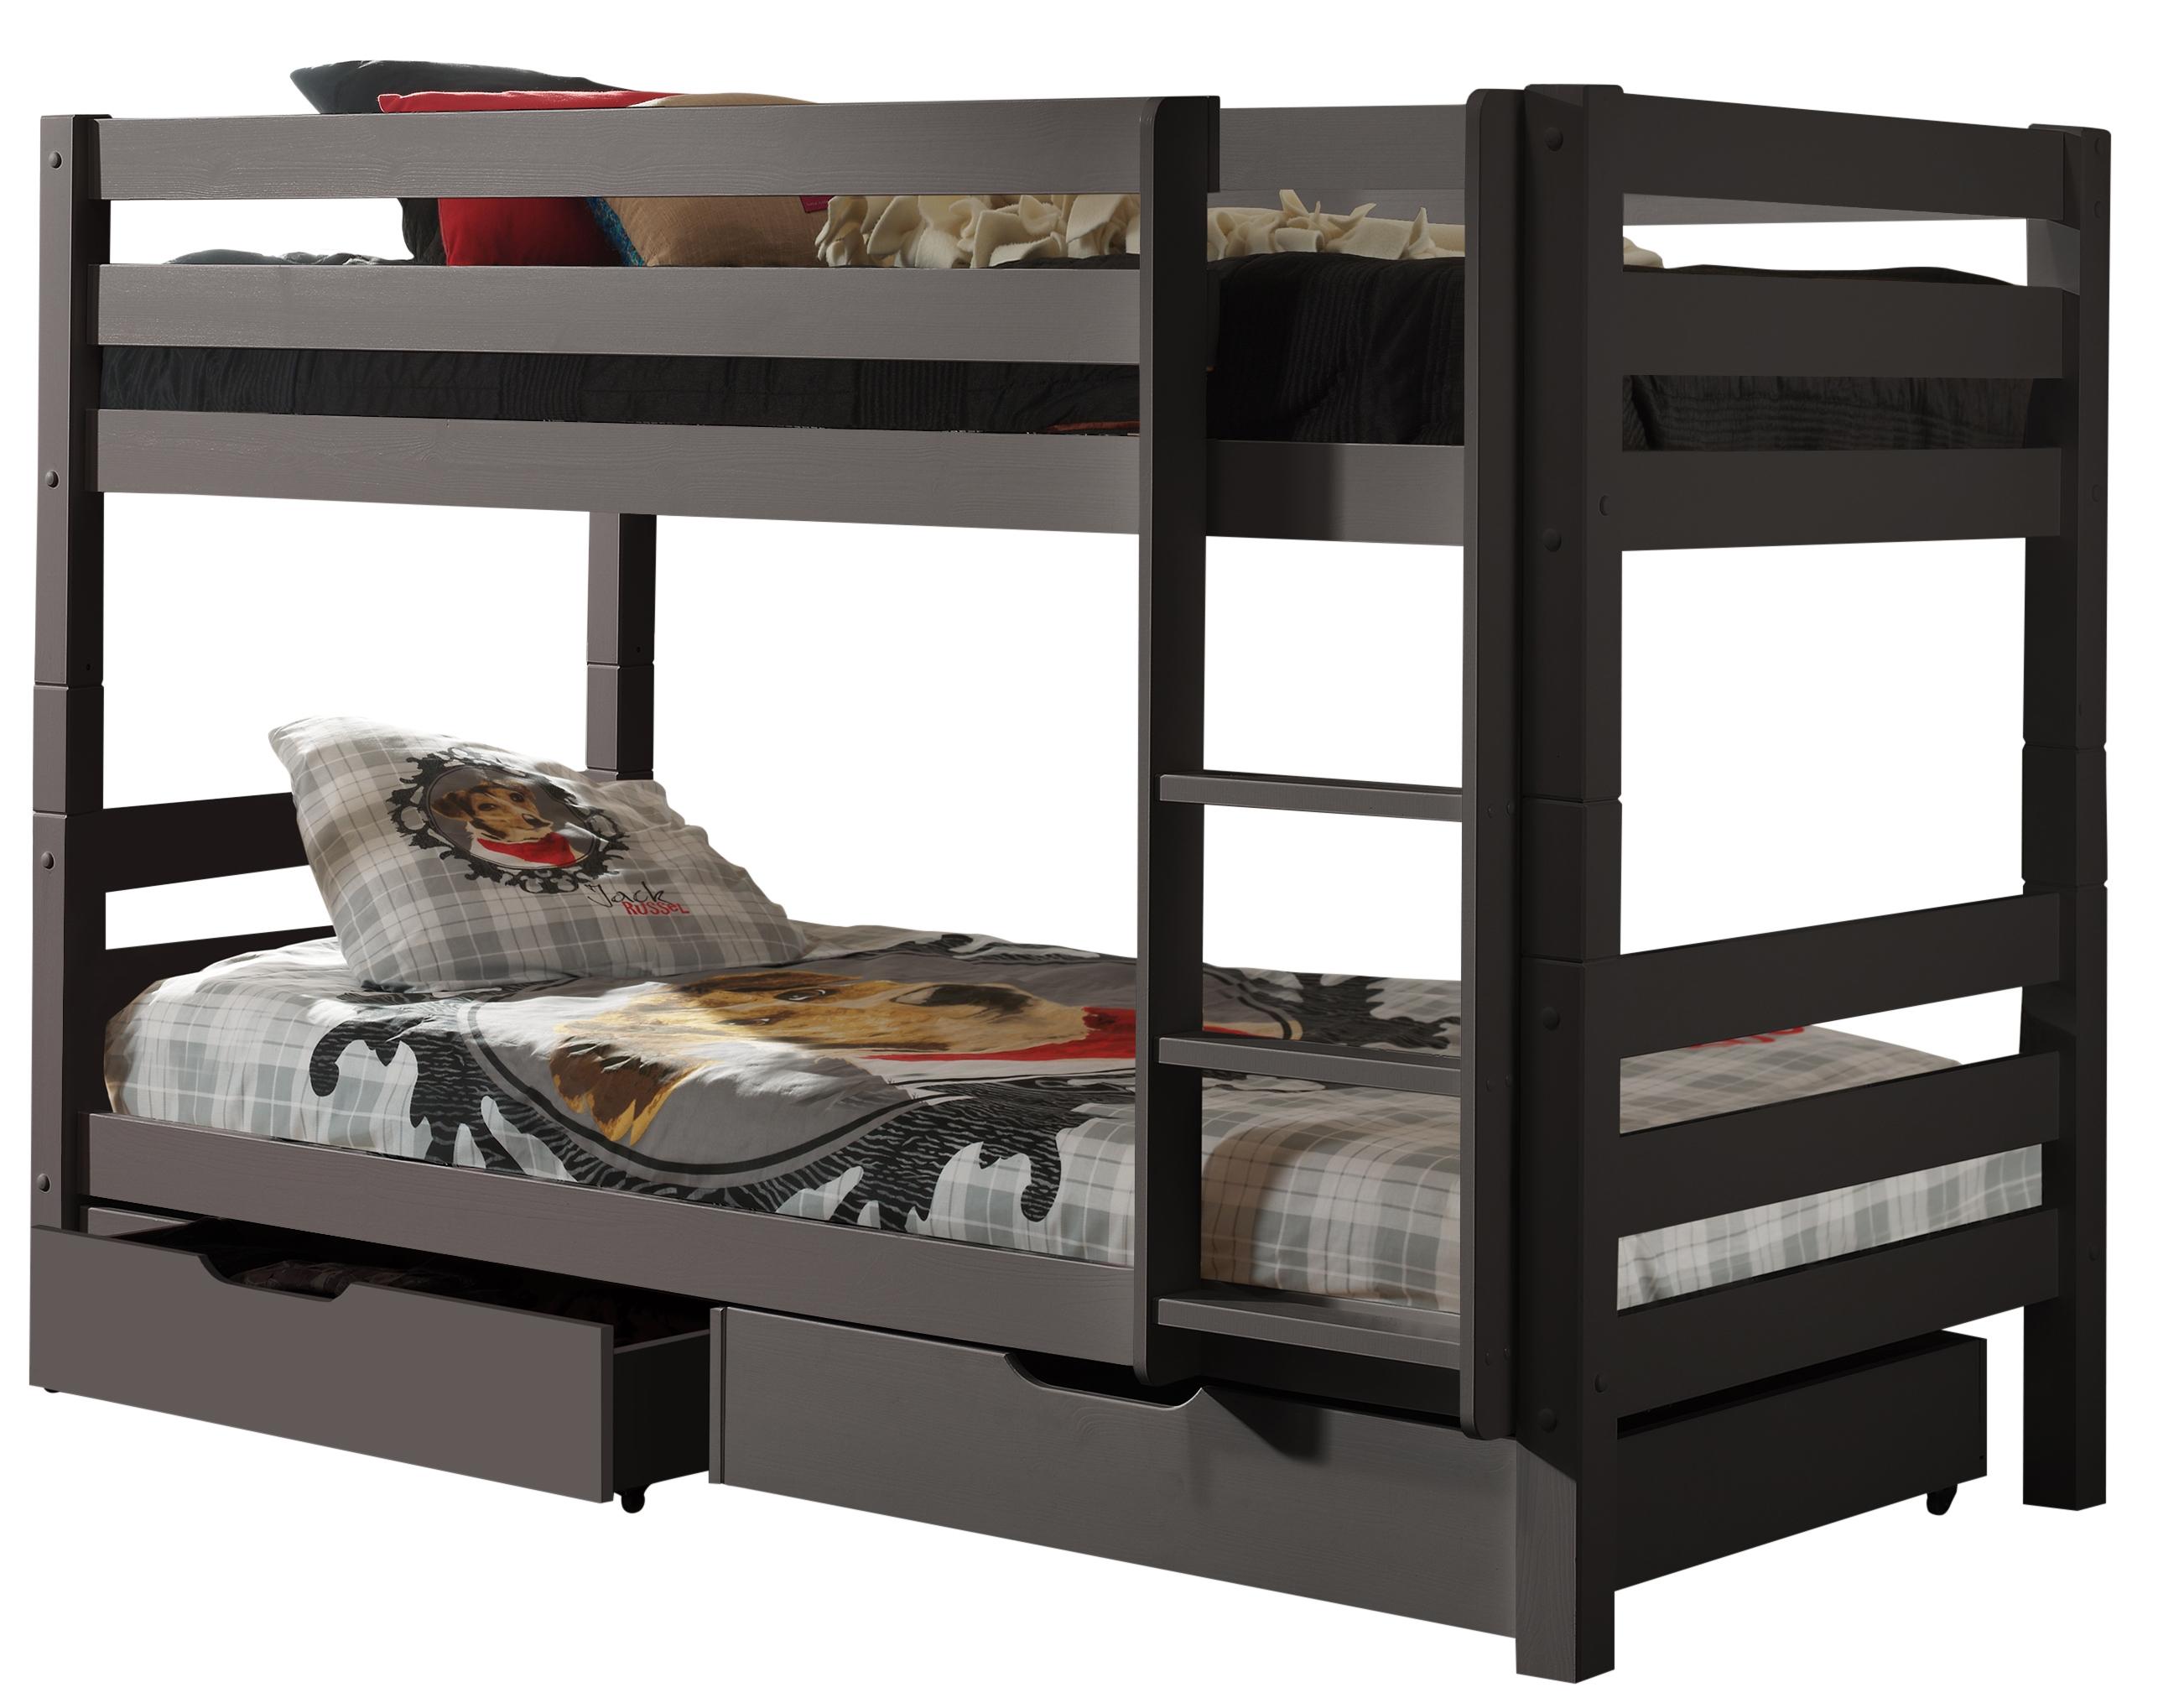 lit superpos avec tiroir pin massif taupe pinie h 140. Black Bedroom Furniture Sets. Home Design Ideas